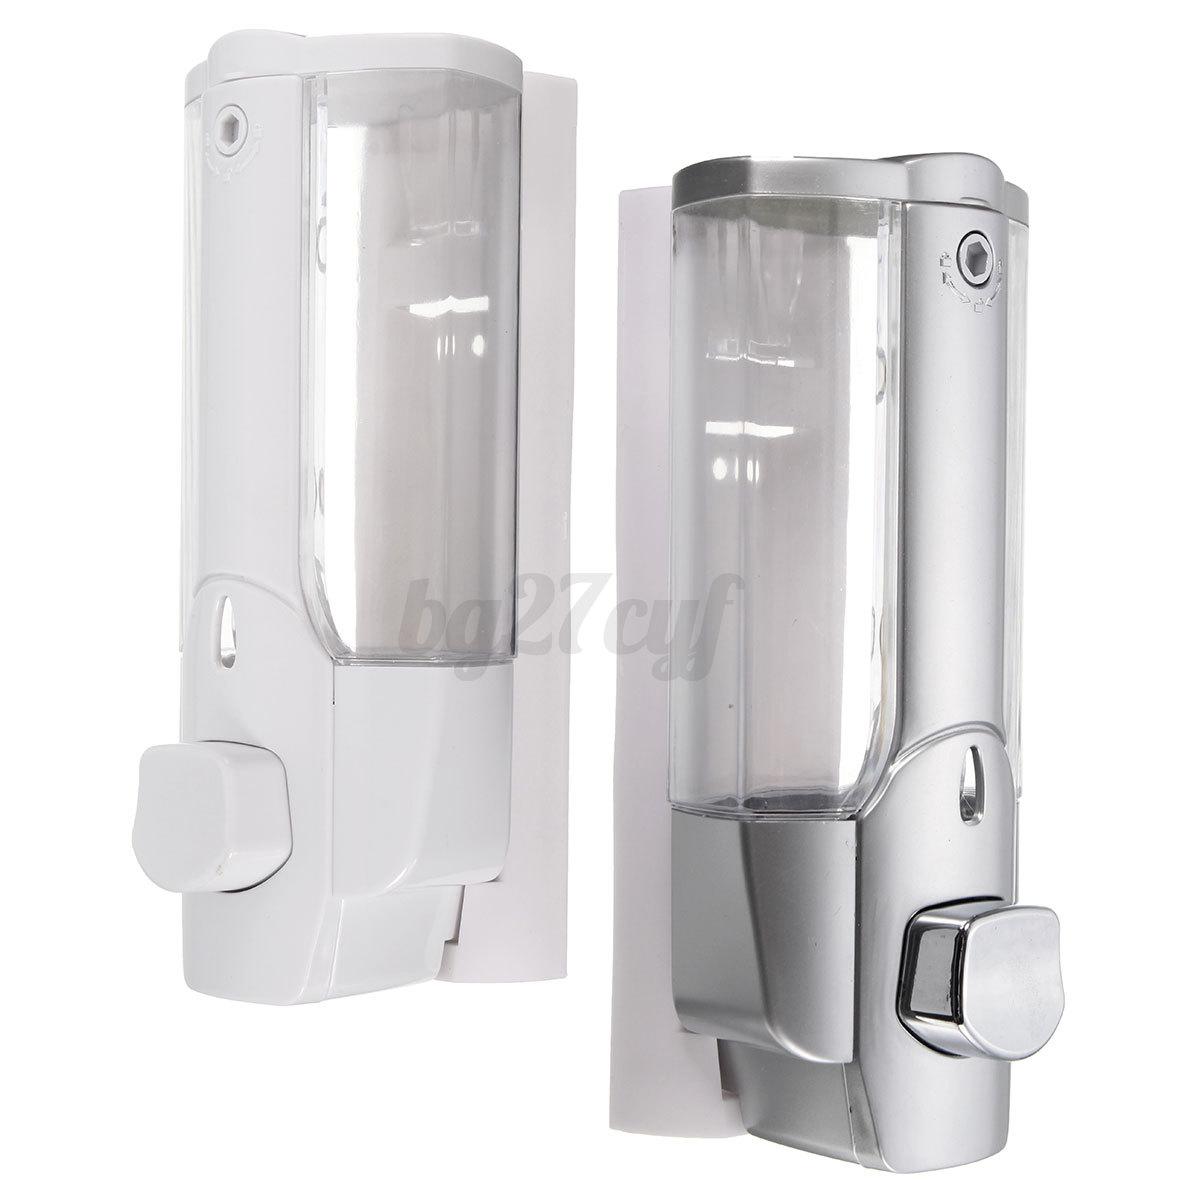 Shower Soap Dispenser ~ Wall mounted shampoo soap dispenser sanitizer bathroom